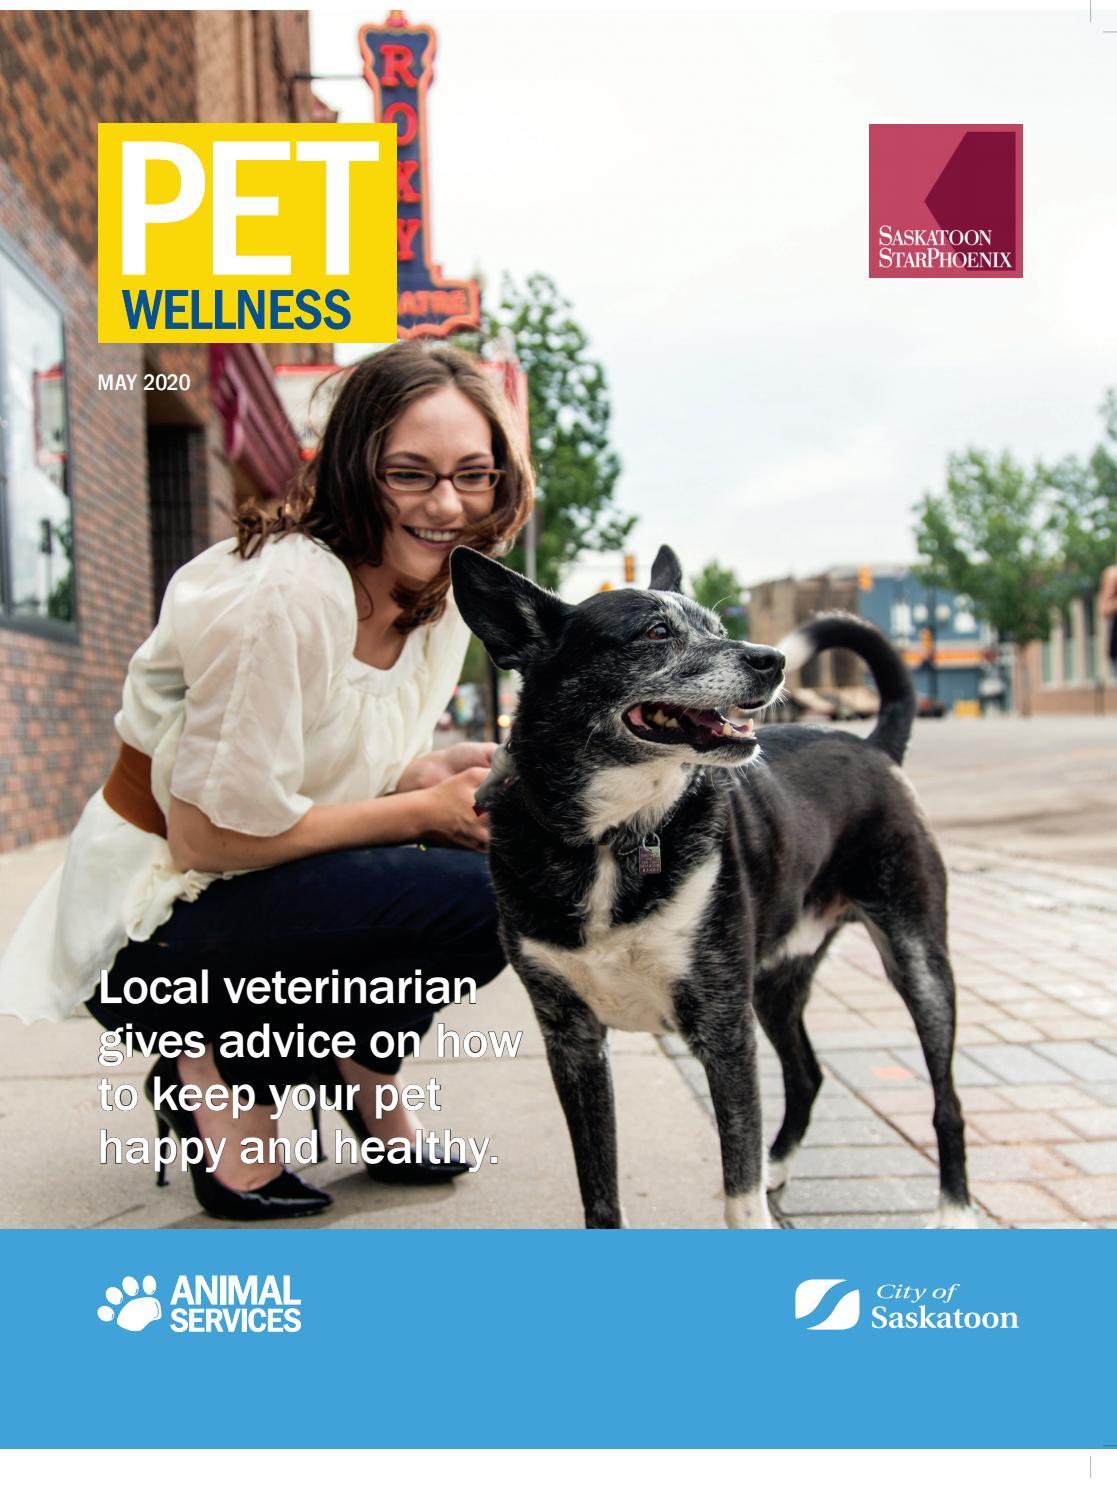 Sp Pet Wellness 2020 By Postmedia Saskatchewan Issuu